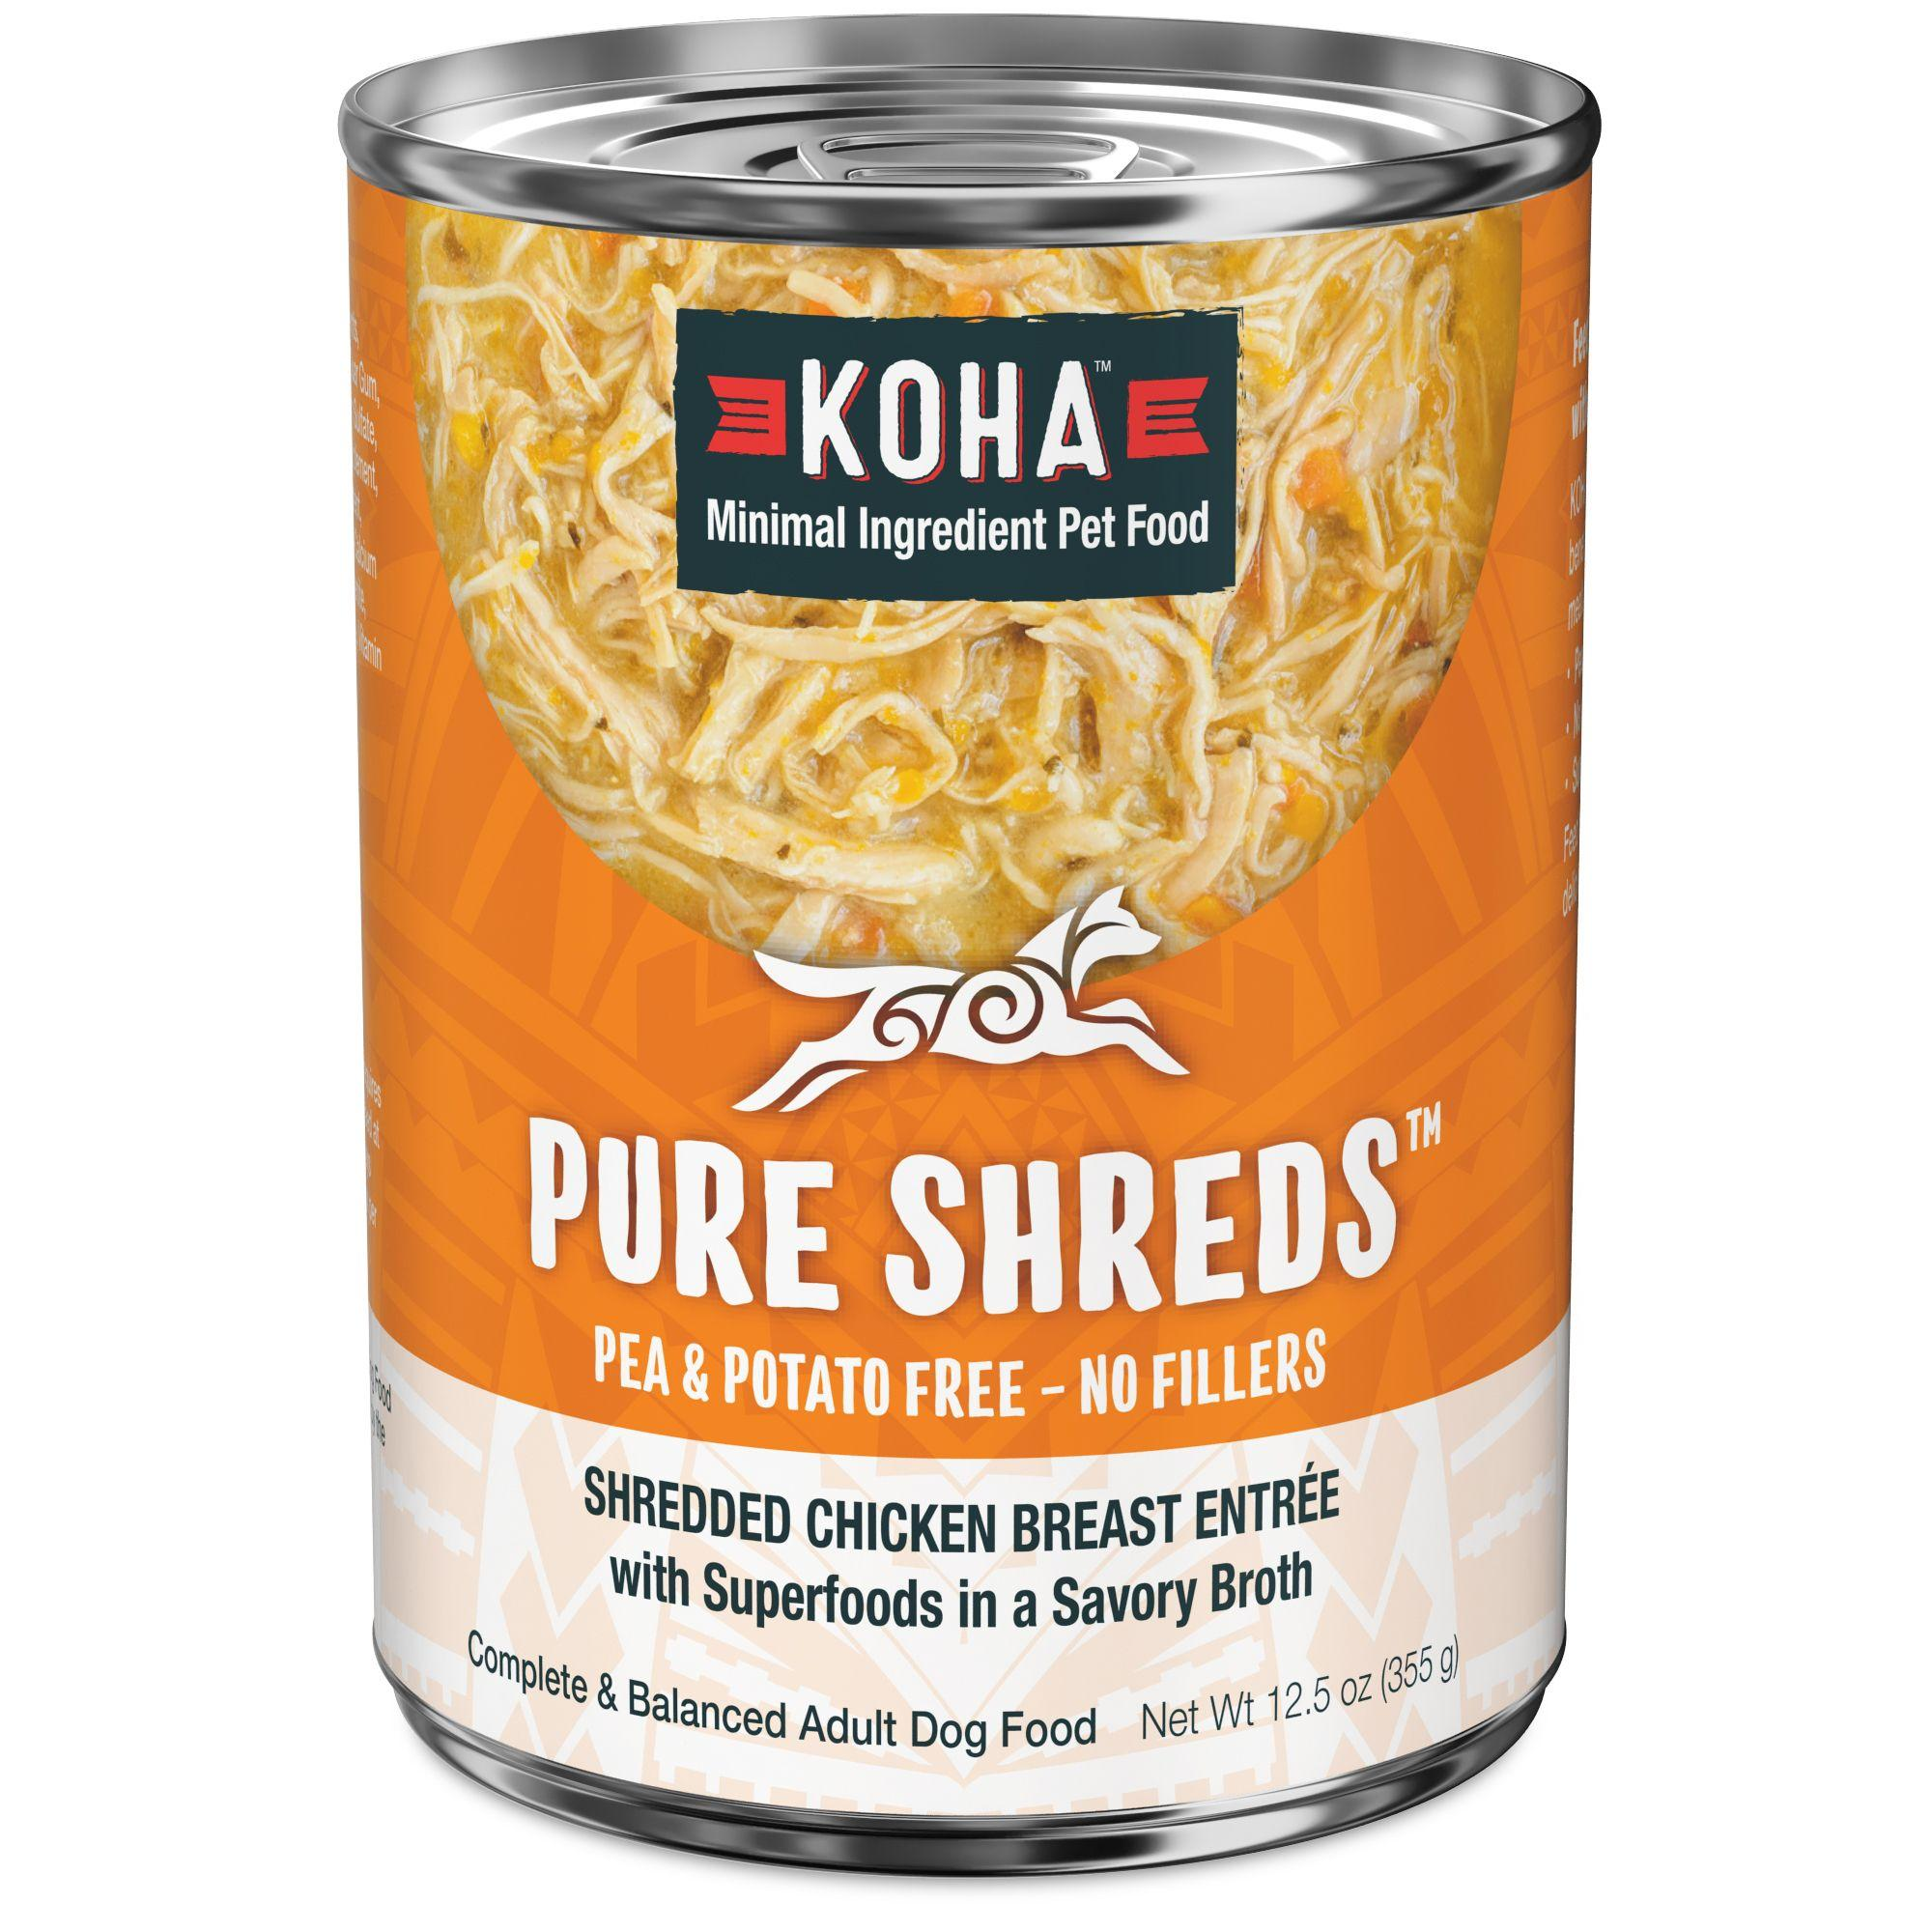 Koha Pure Shreds Shredded Chicken Breast Entree Canned Dog Food, 12.5-oz